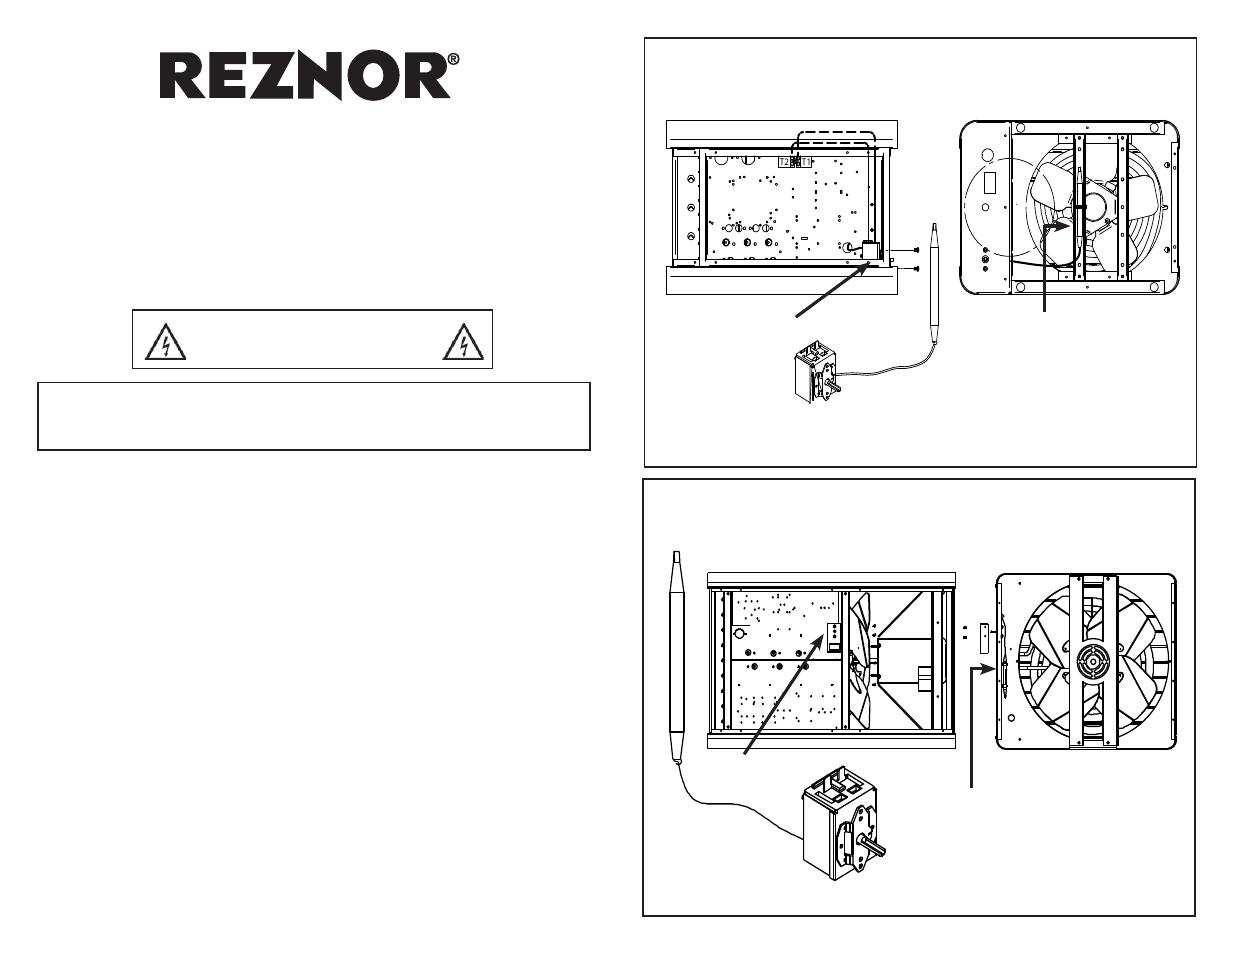 reznor eghb option - installation - thermostat kit manuel ... honeywell heat pump thermostat wiring diagram capillary thermostat wiring diagram